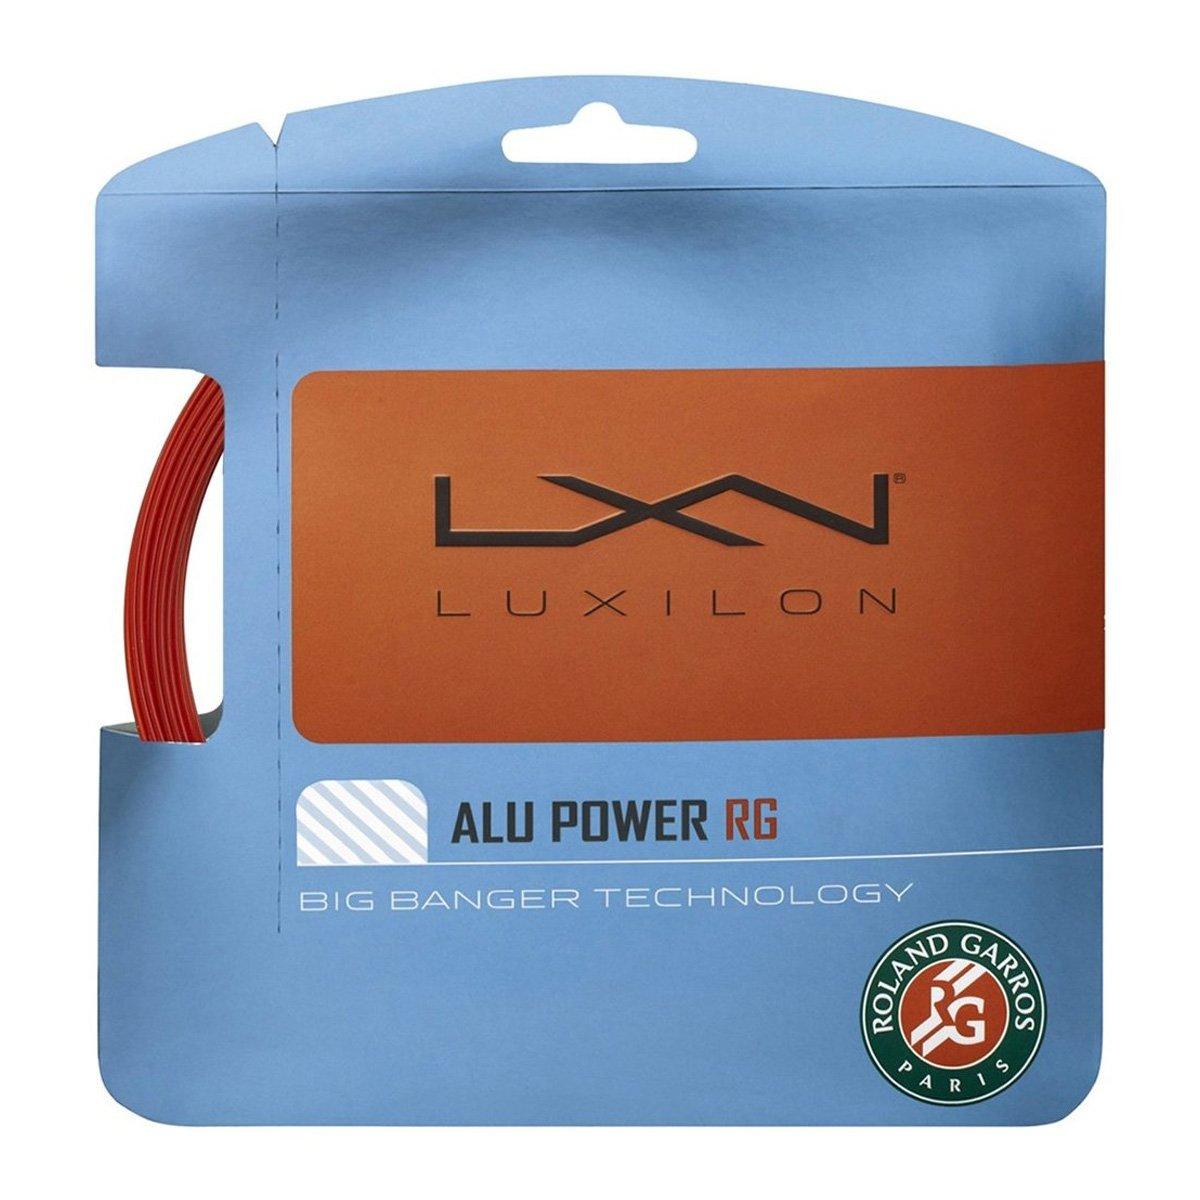 Corda de Tenis Luxilon ALU Power Roland Garros SET 1.28